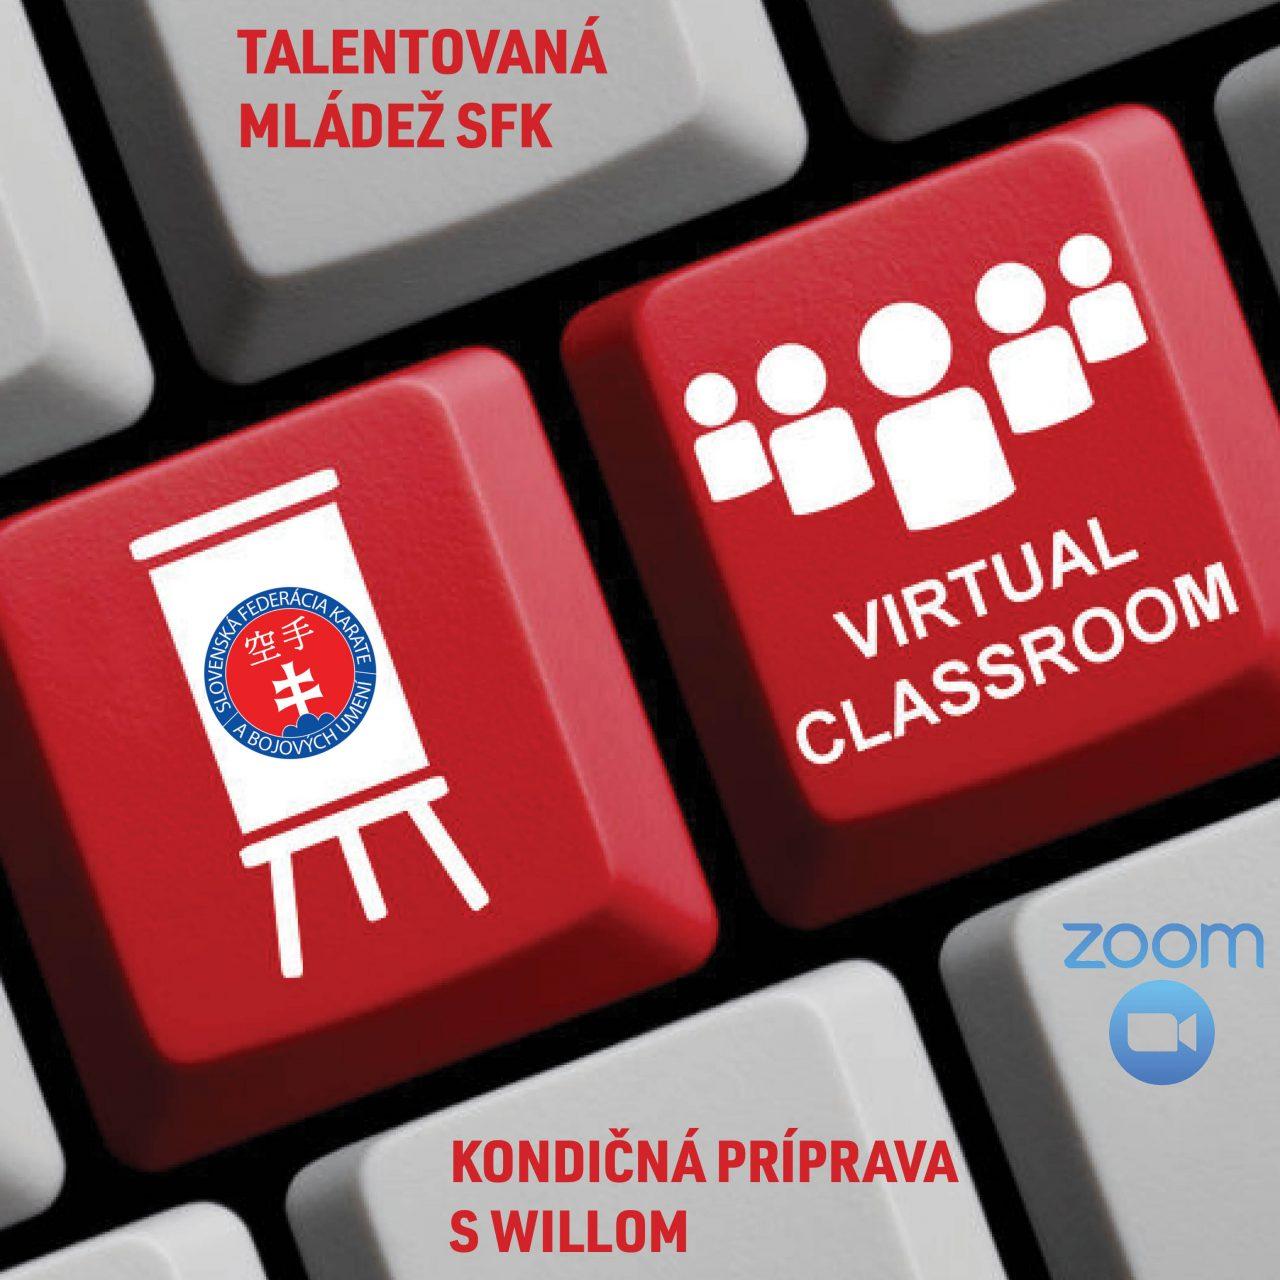 https://karate-slovakia.sk/wp-content/uploads/online-treningy_tm_Willo-1280x1280.jpg